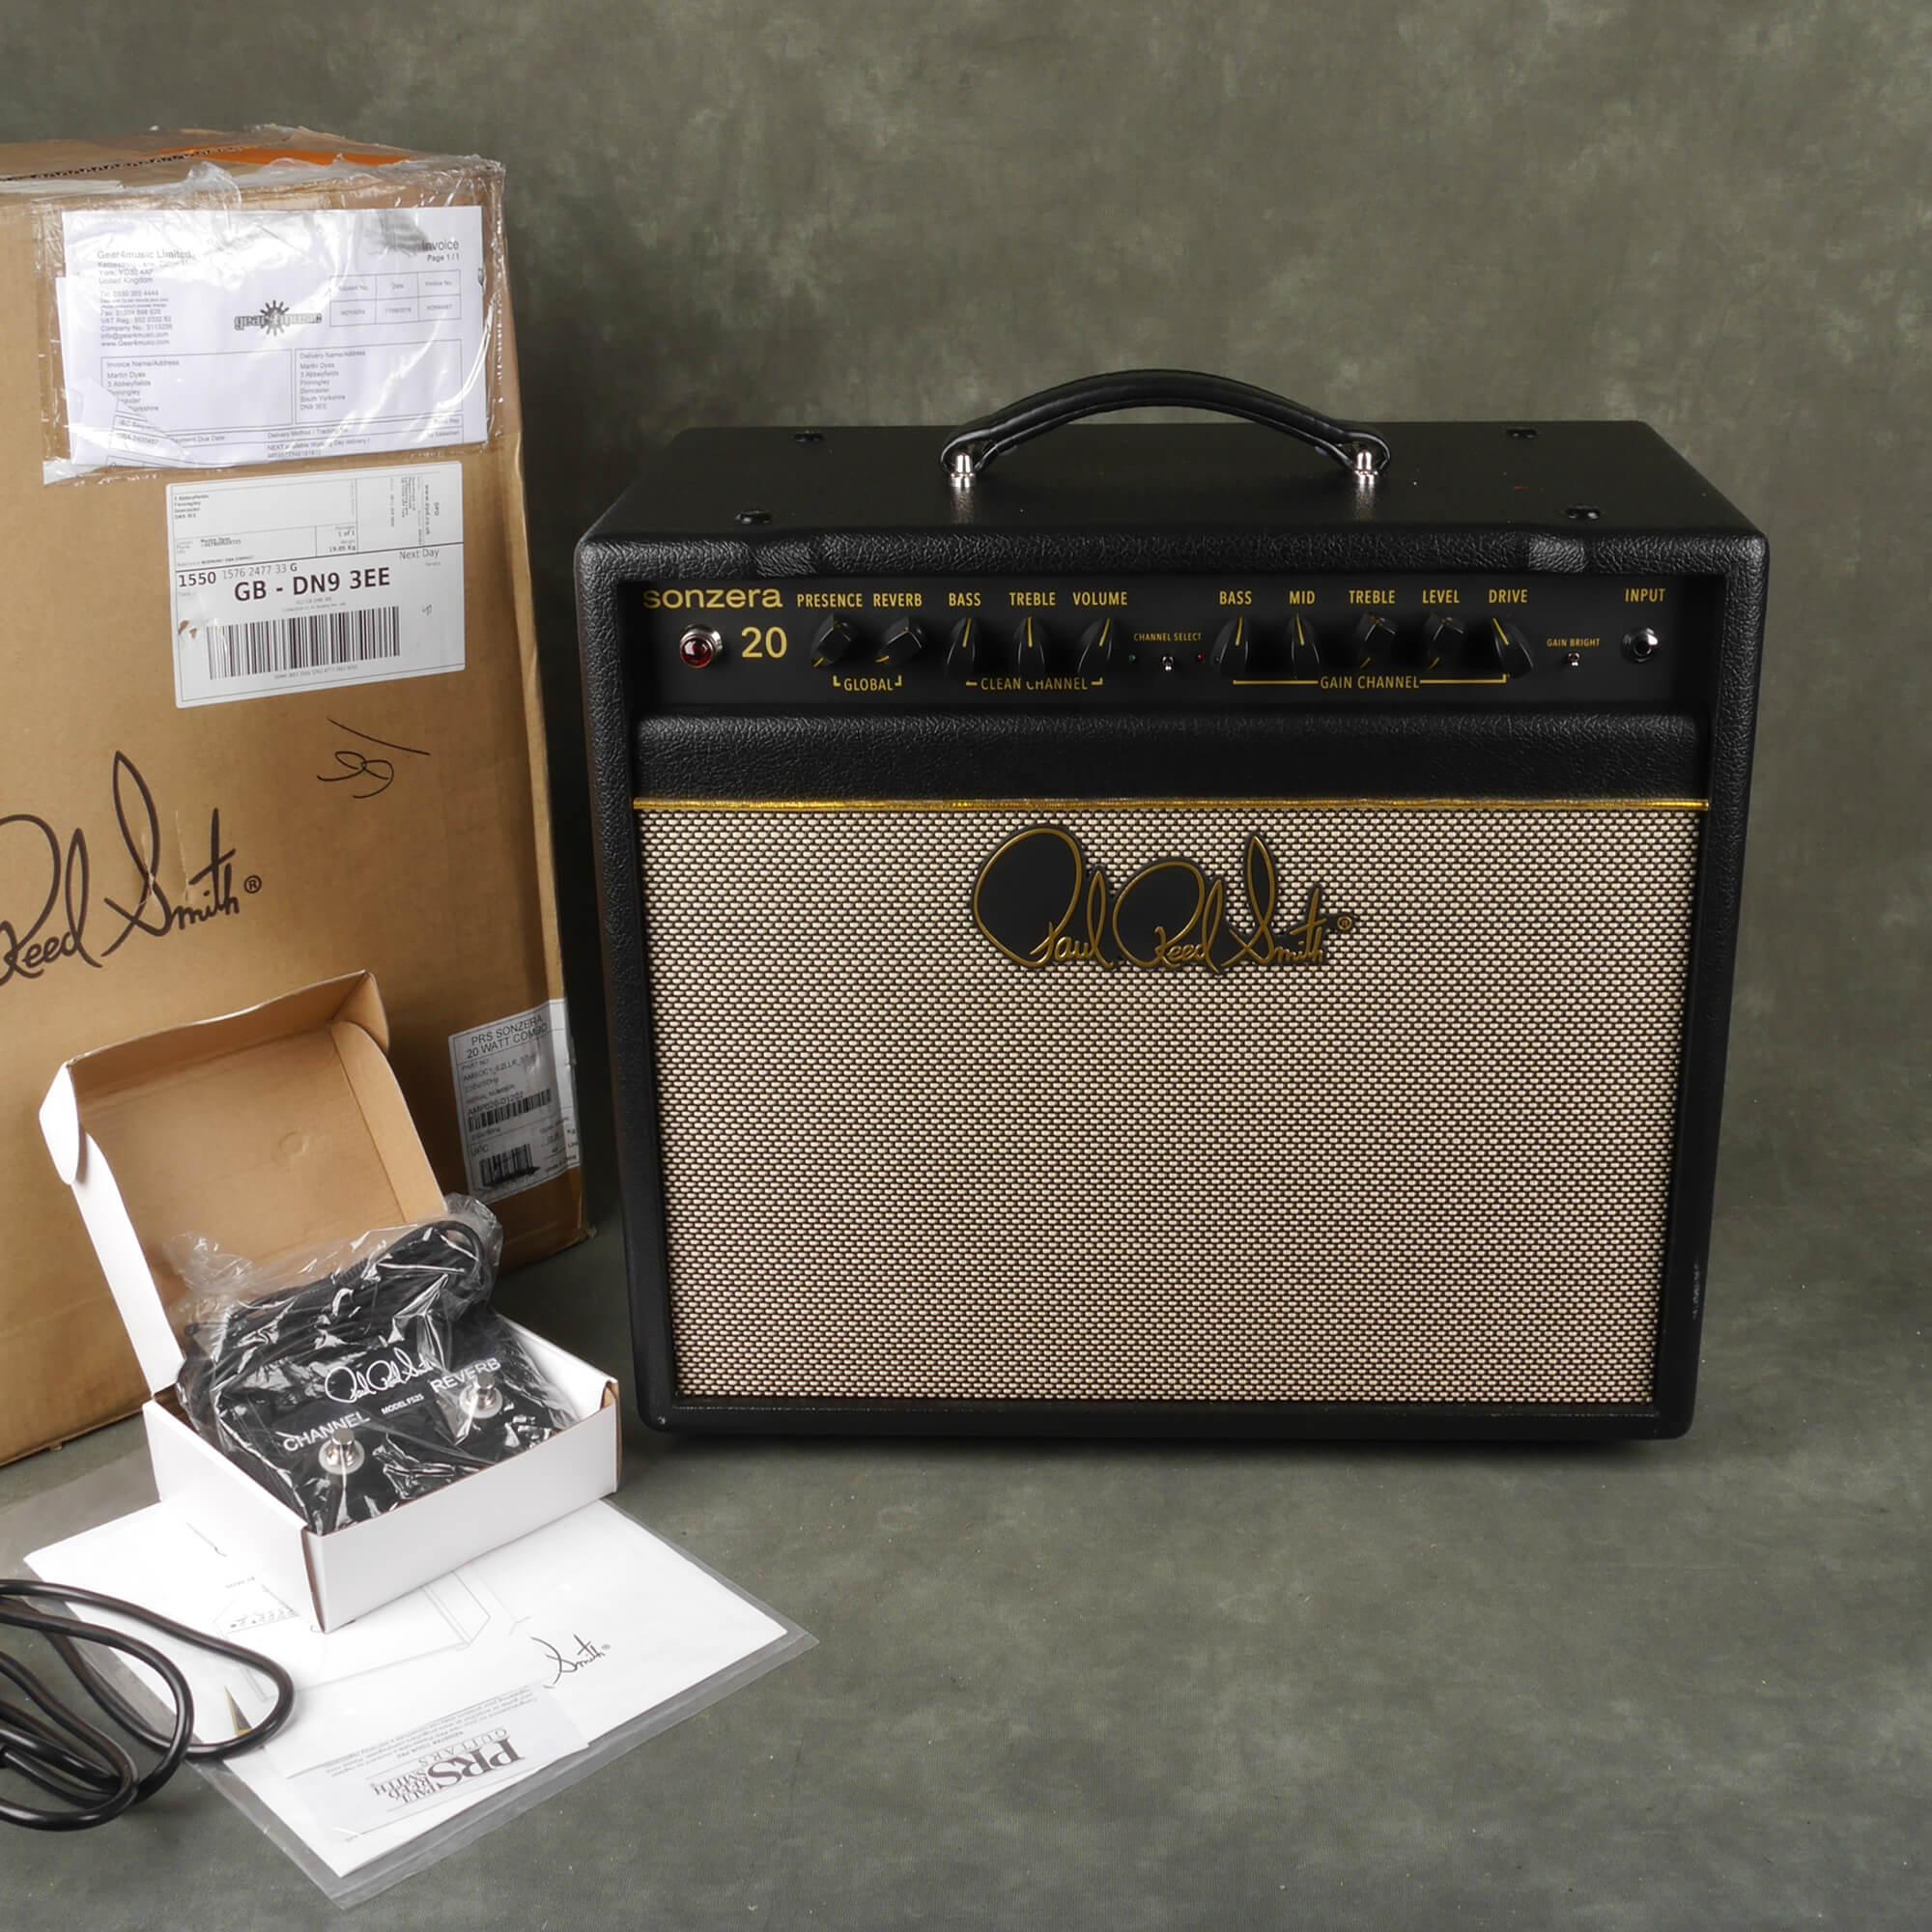 PRS Sonzera 20w Combo Amplifier w/Box - 2nd Hand